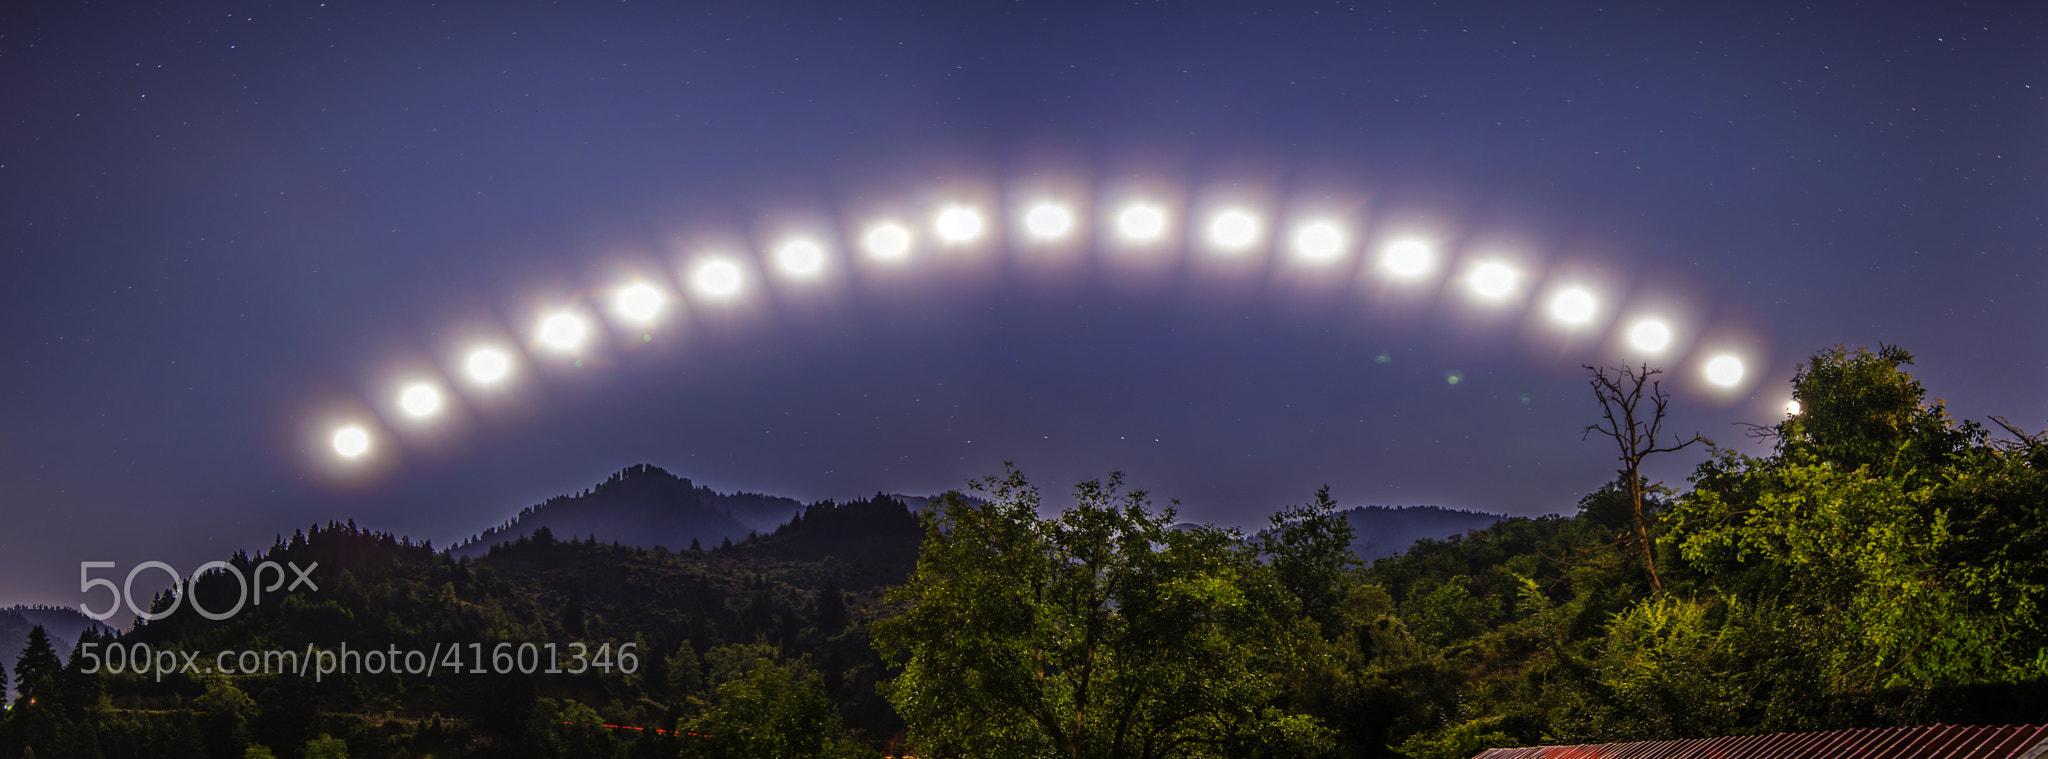 Photograph The moon's travel... by KONSTANTINOS BASILAKAKOS on 500px